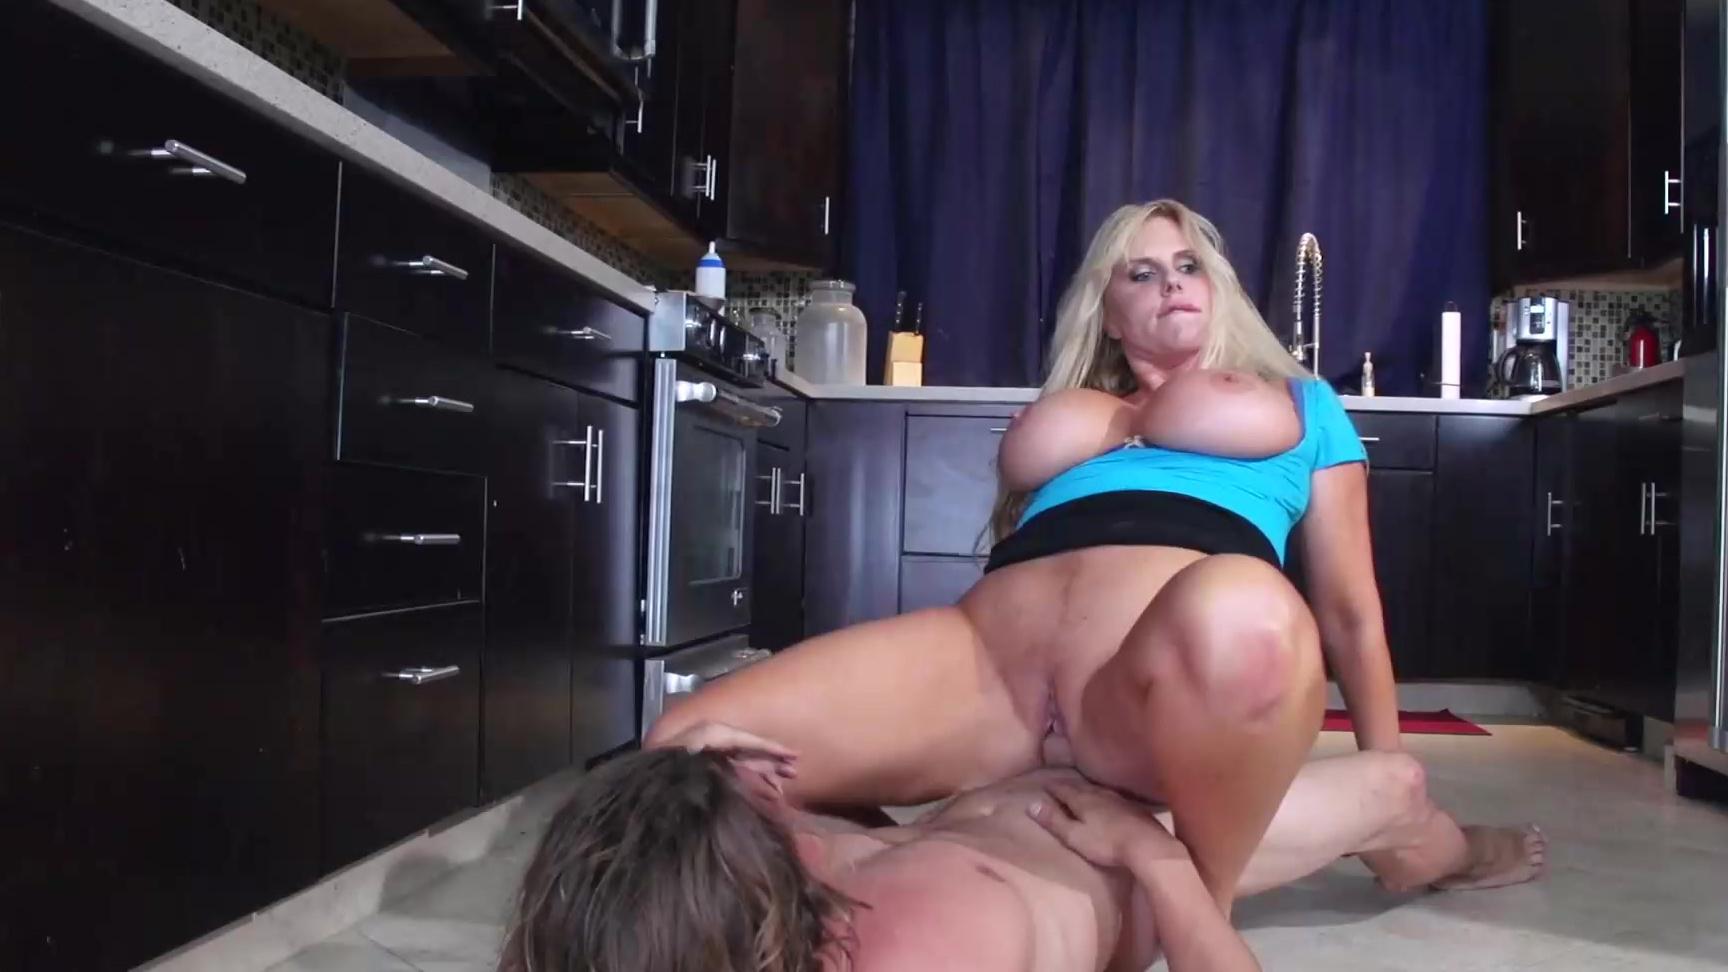 Rita hairy pussy cam show xvideos com